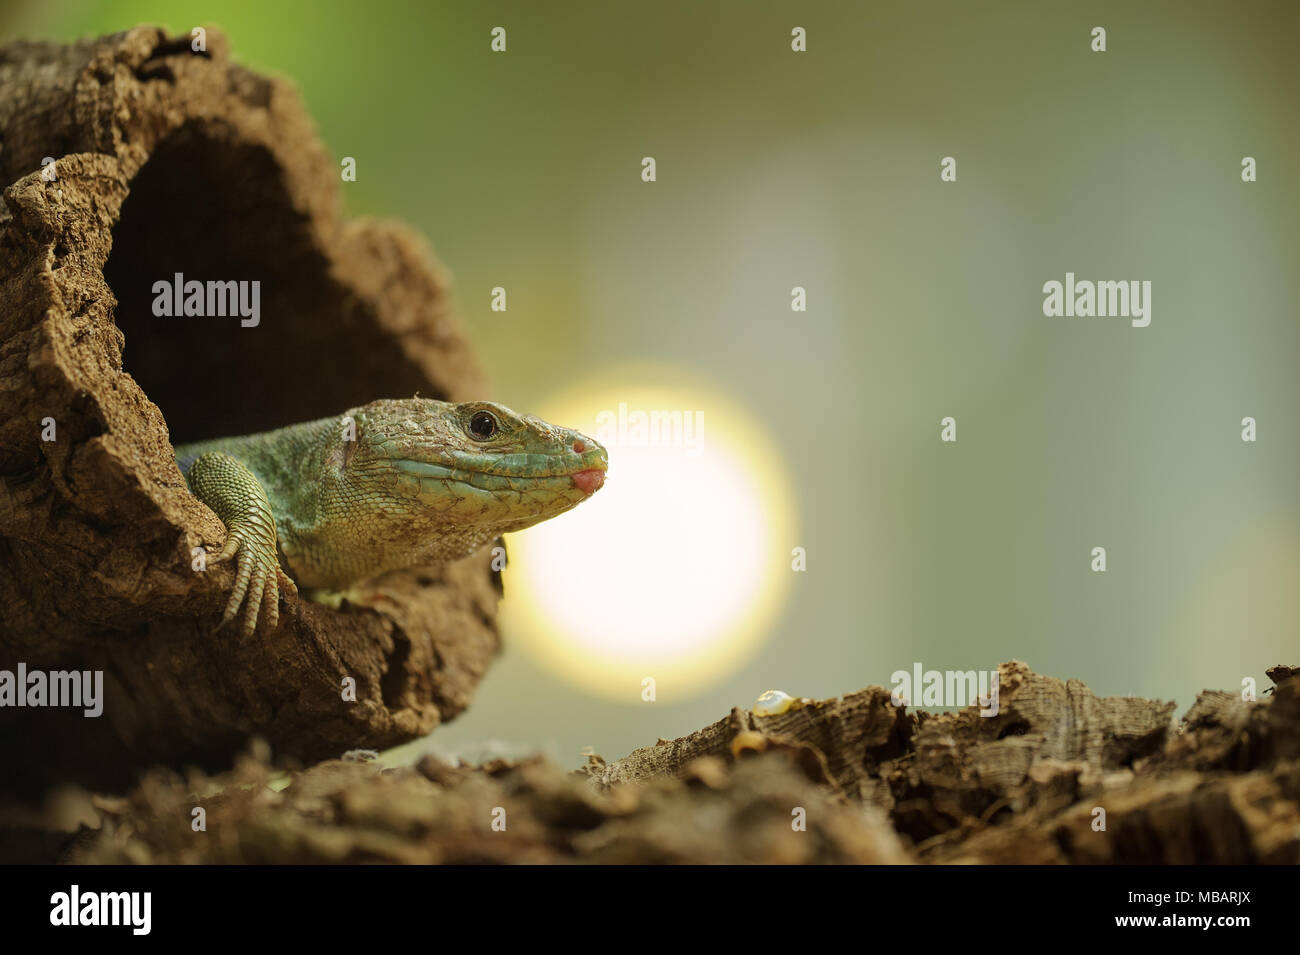 Ocellated lizard en el árbol hueco con sun en segundo plano. Imagen De Stock